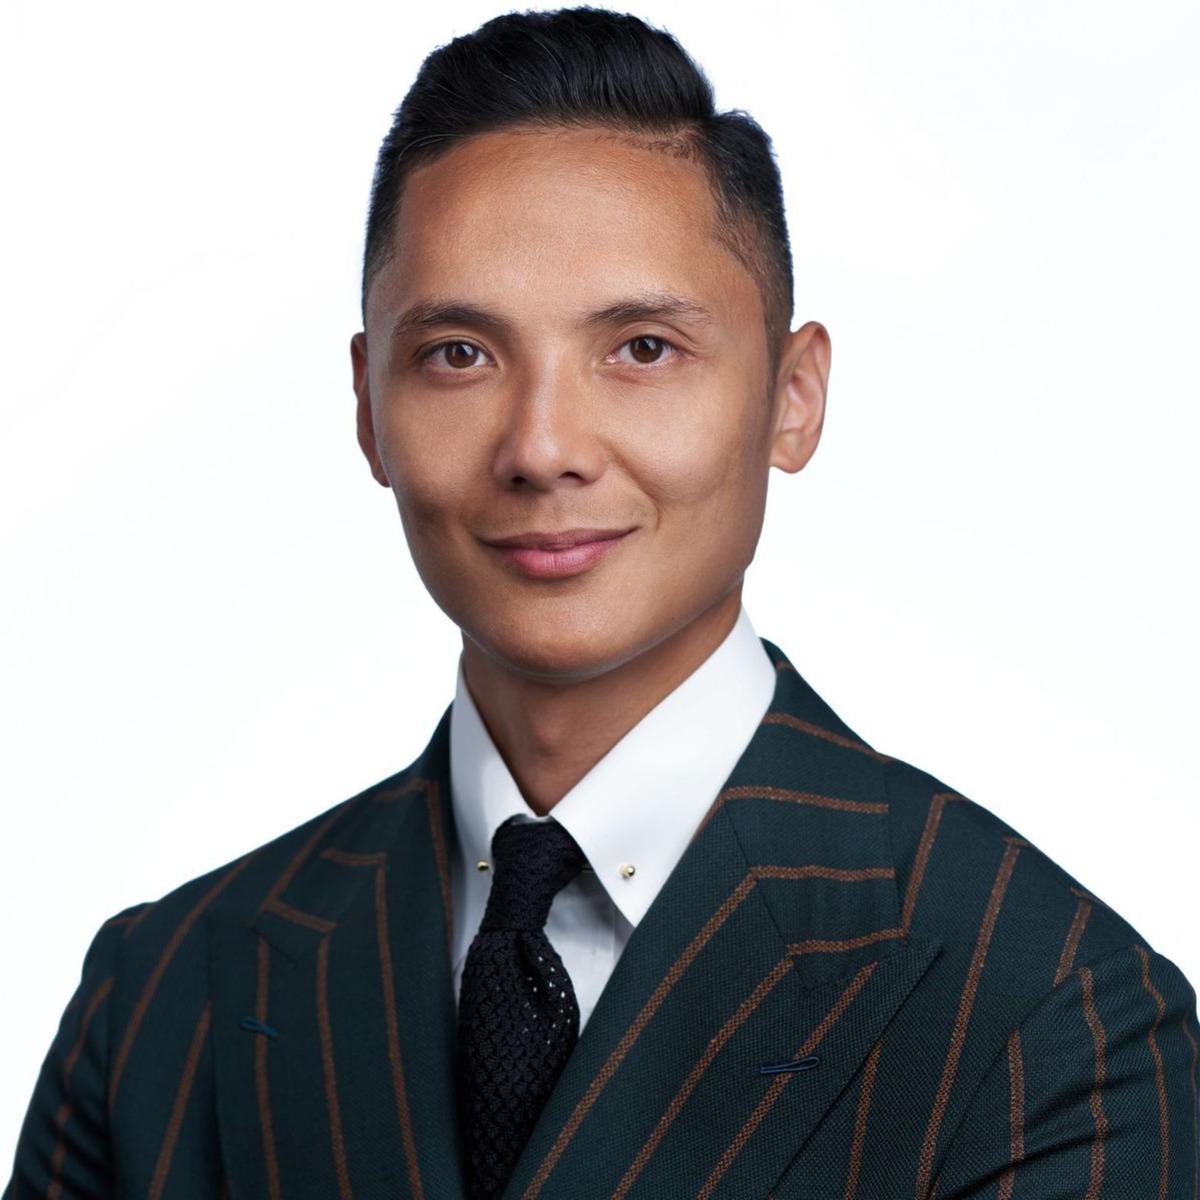 Scott Bautista